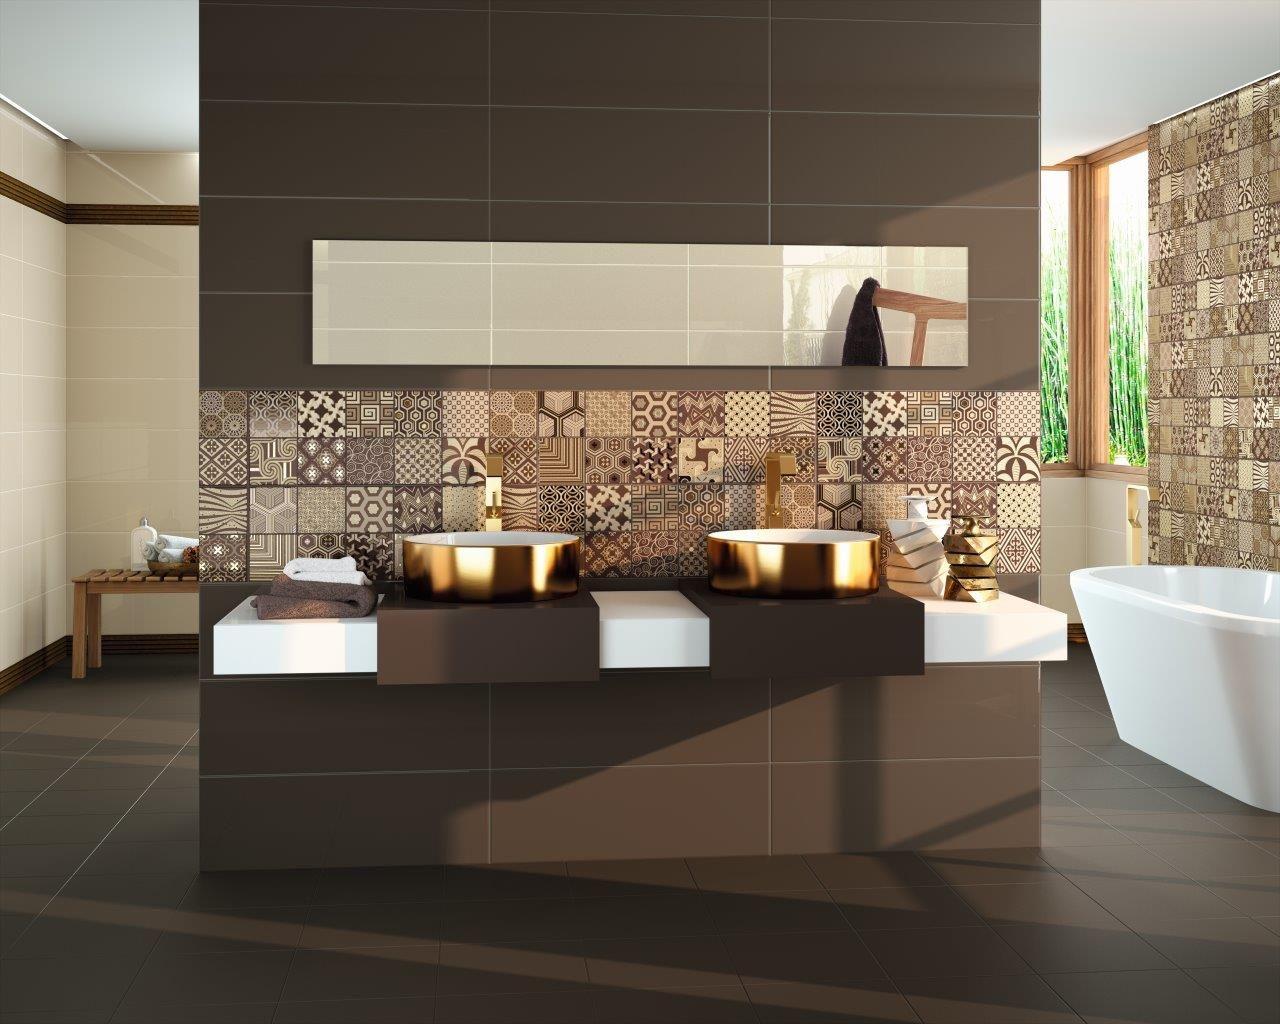 Decorator Tiles 16 Best Dune Decorative Tiles & Ceramics Images On Pinterest